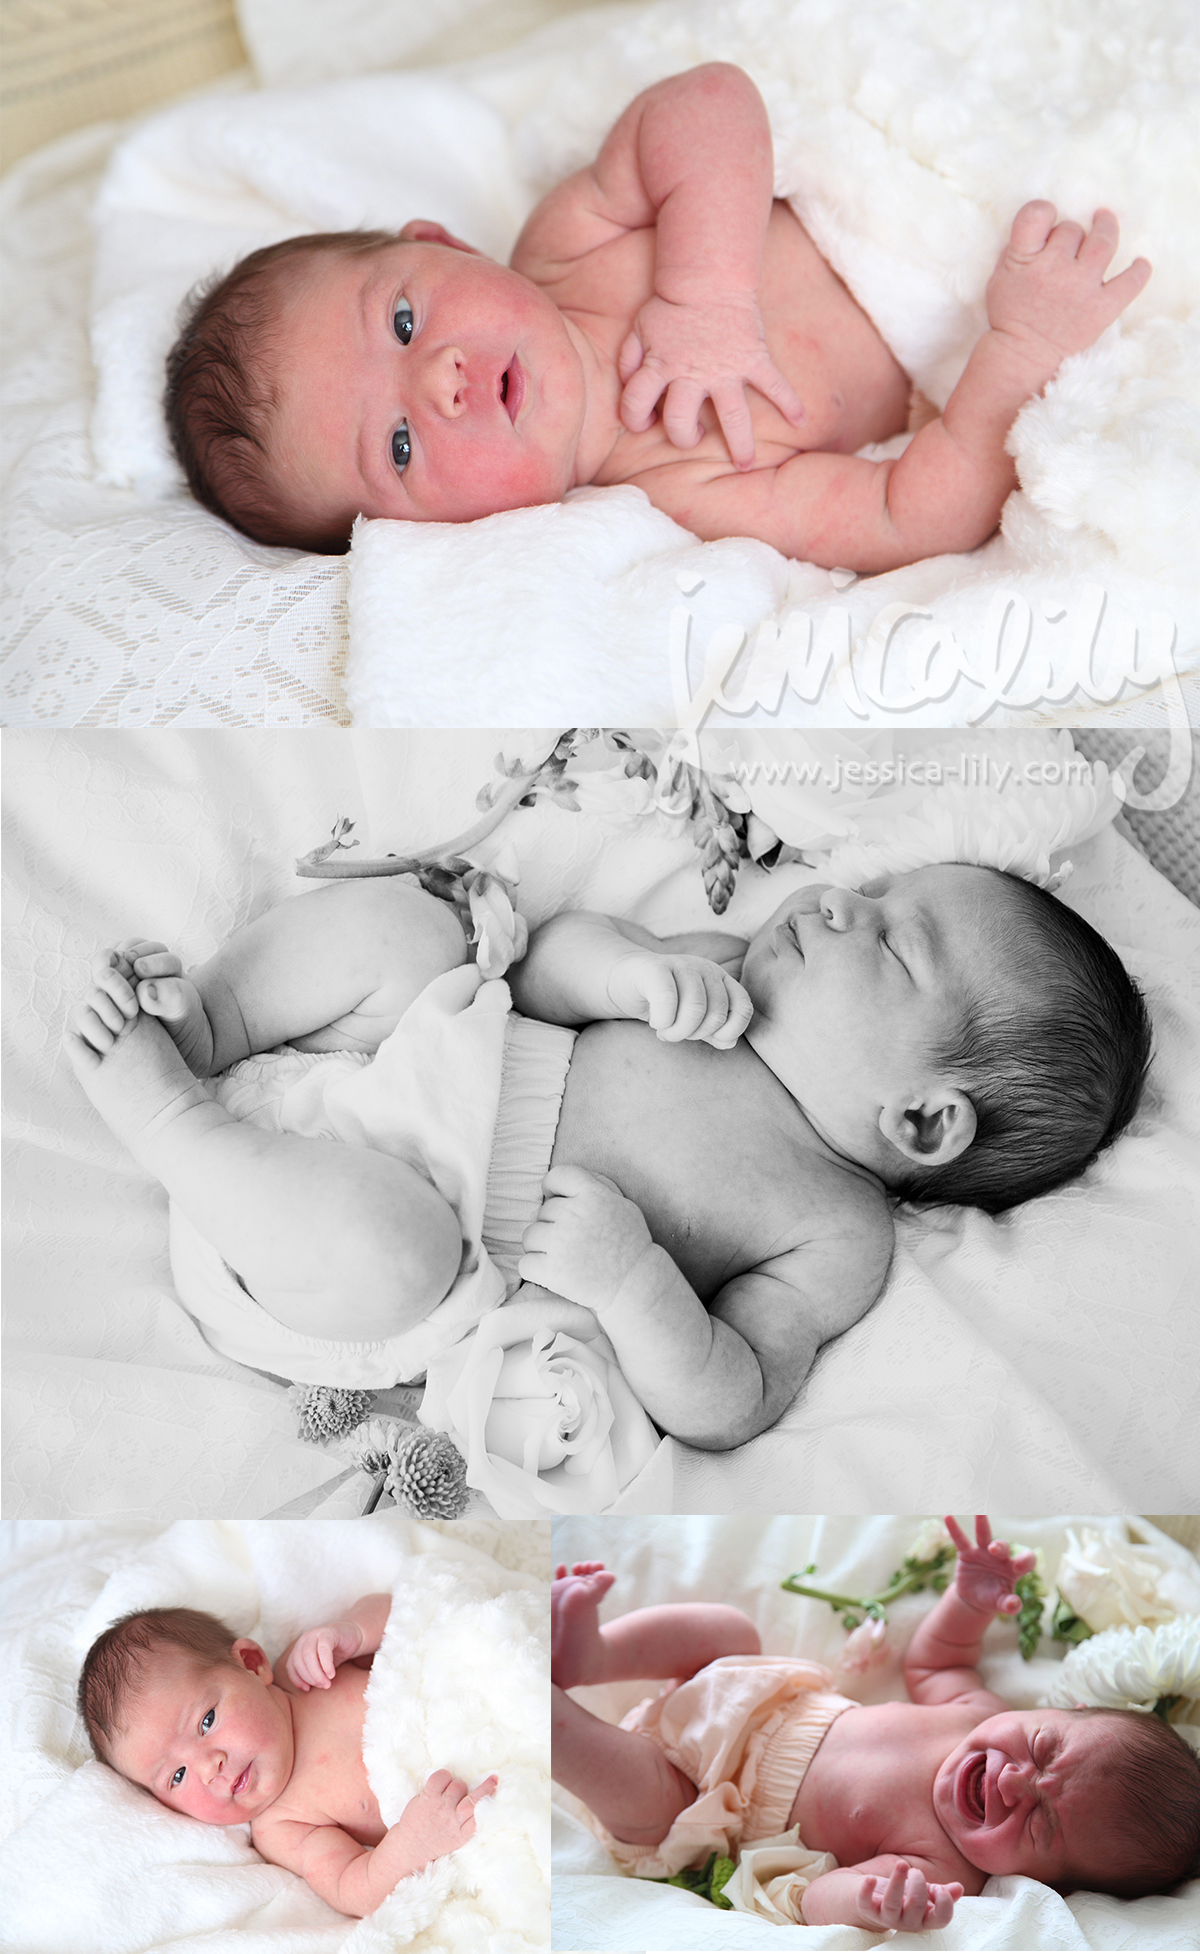 Jessica Lily - My Family